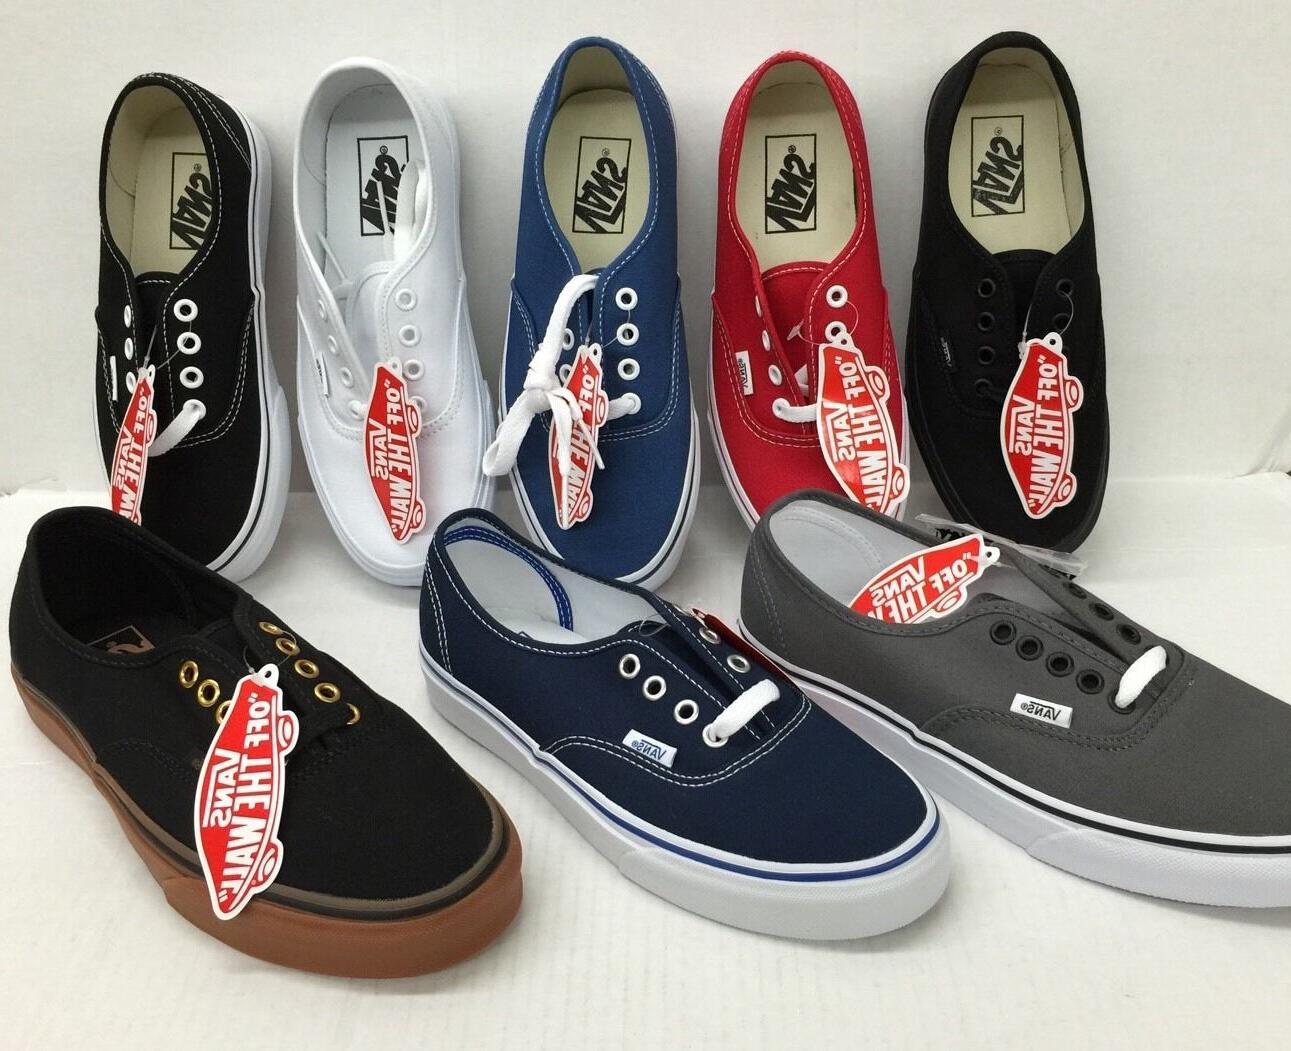 Vans Authentic Classic Sneakers Unisex Canvas Shoes NWT.